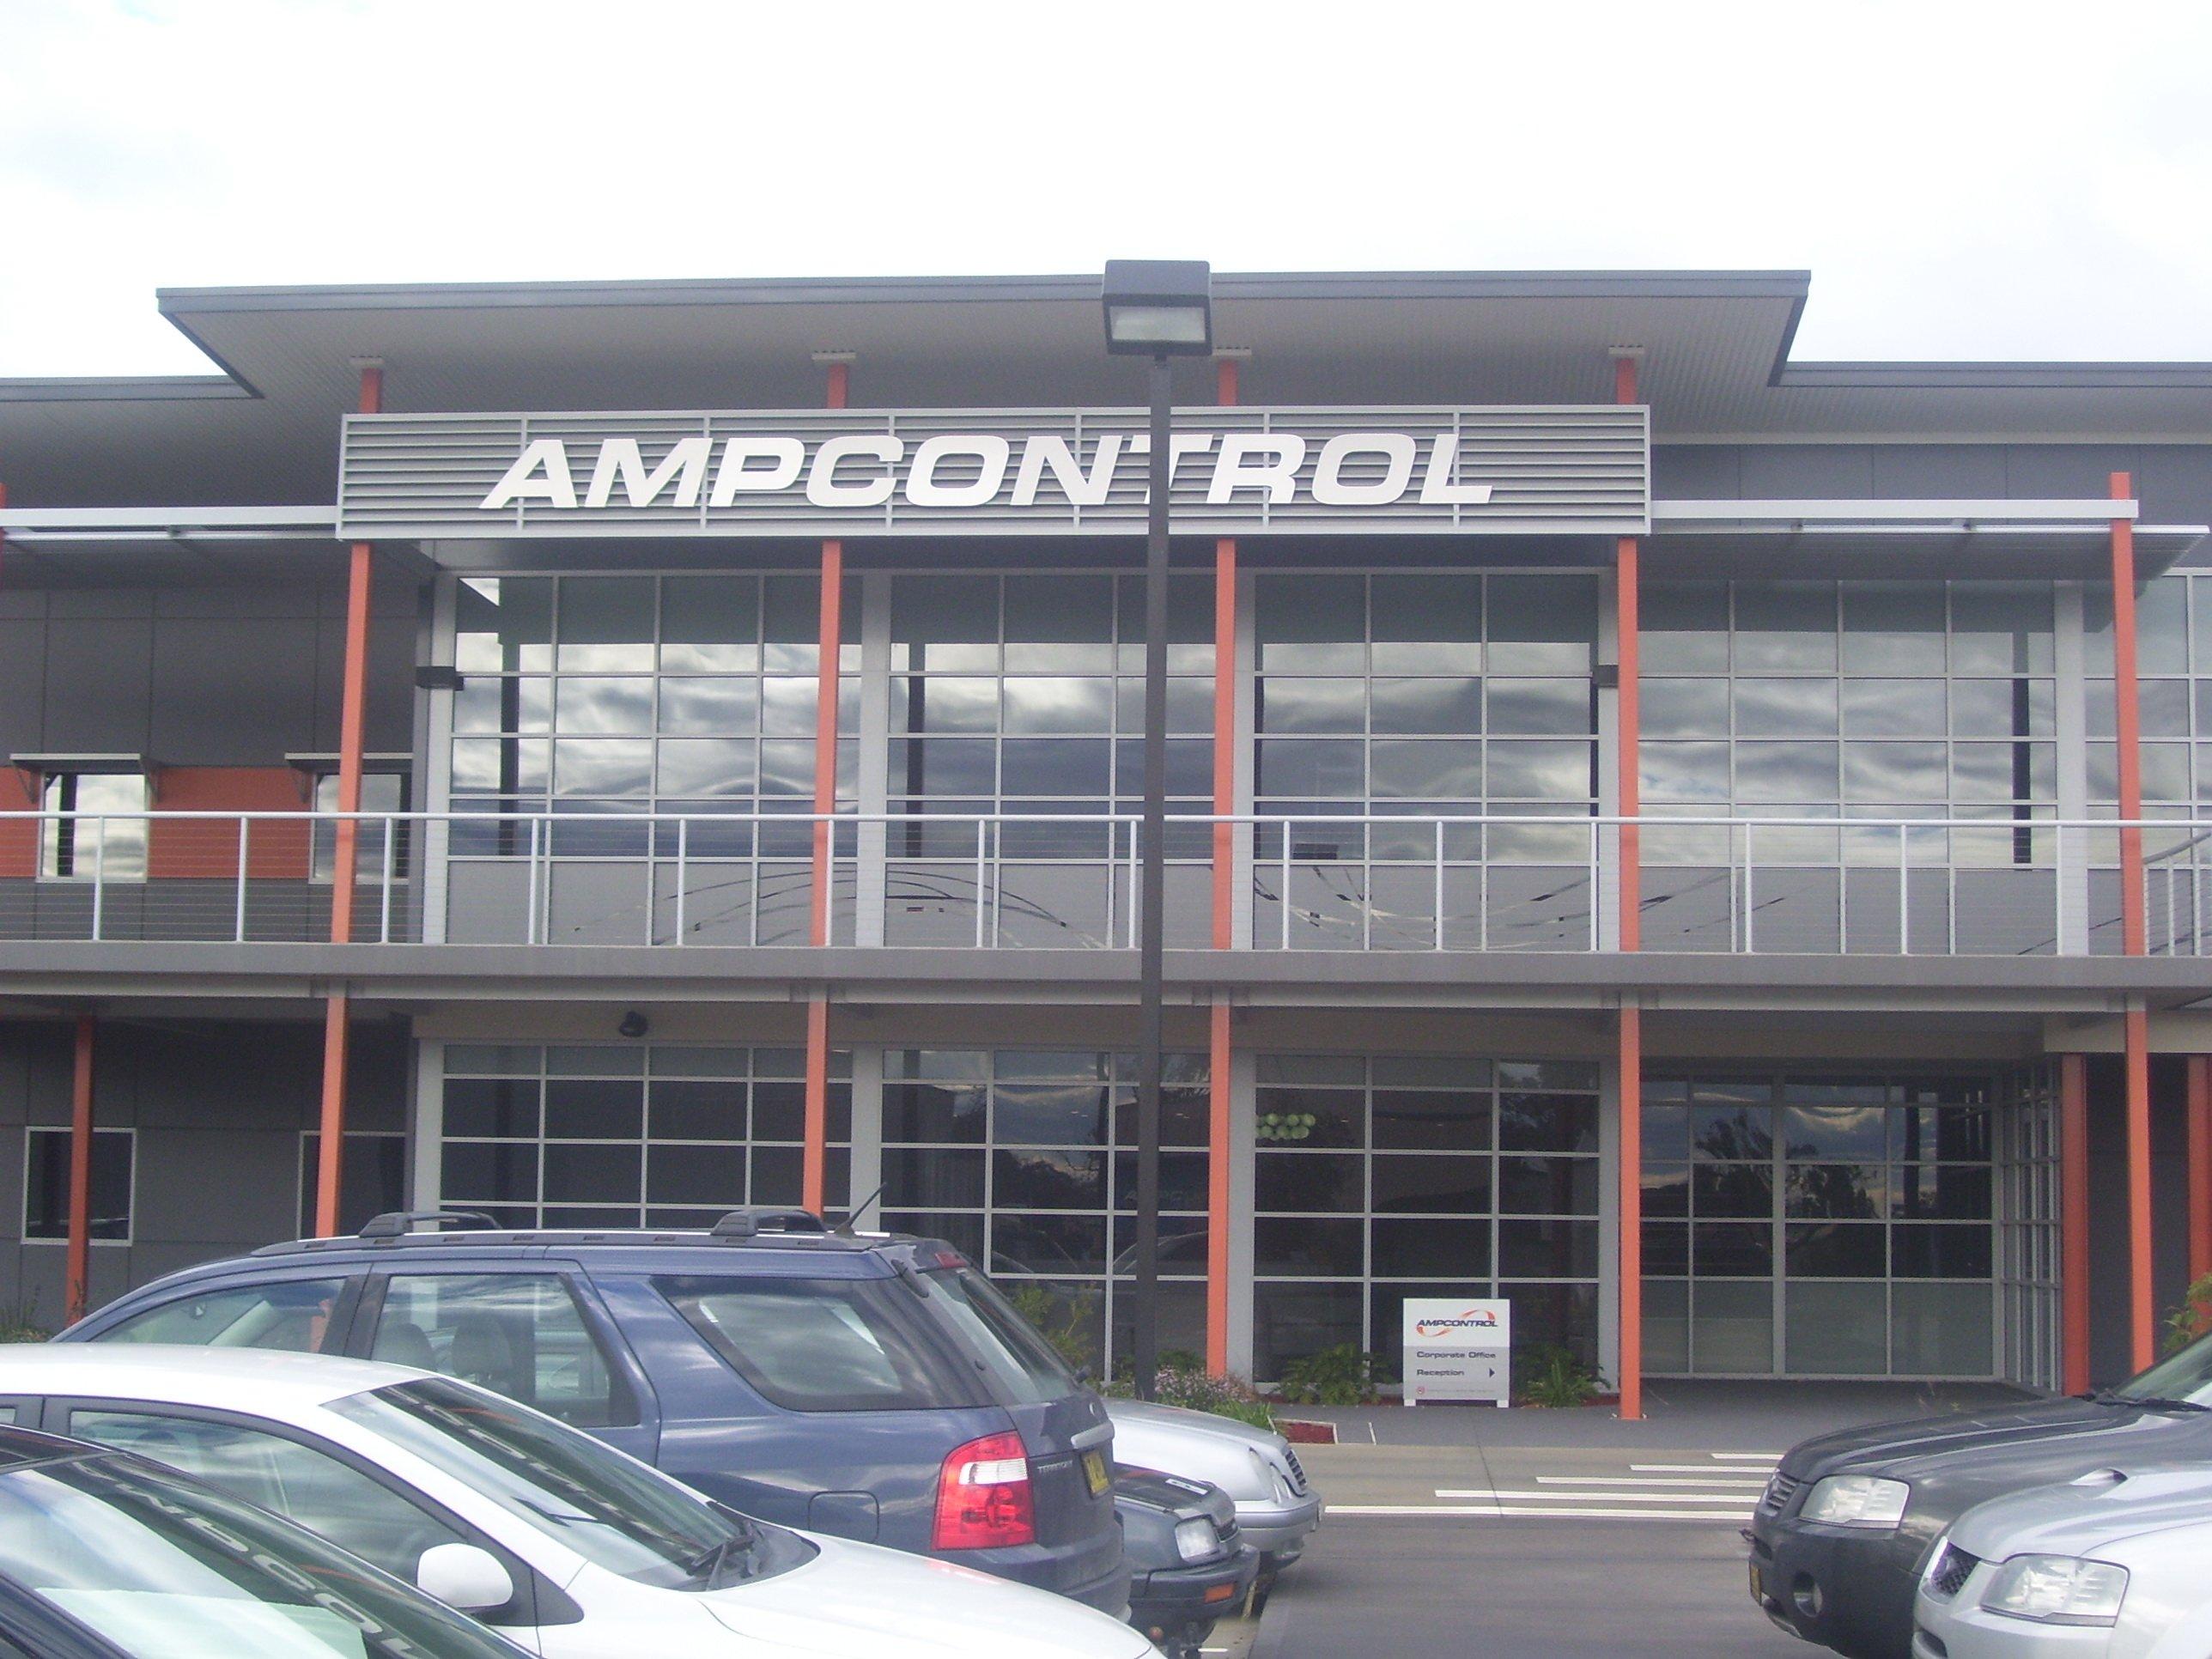 Ampcontrol Building